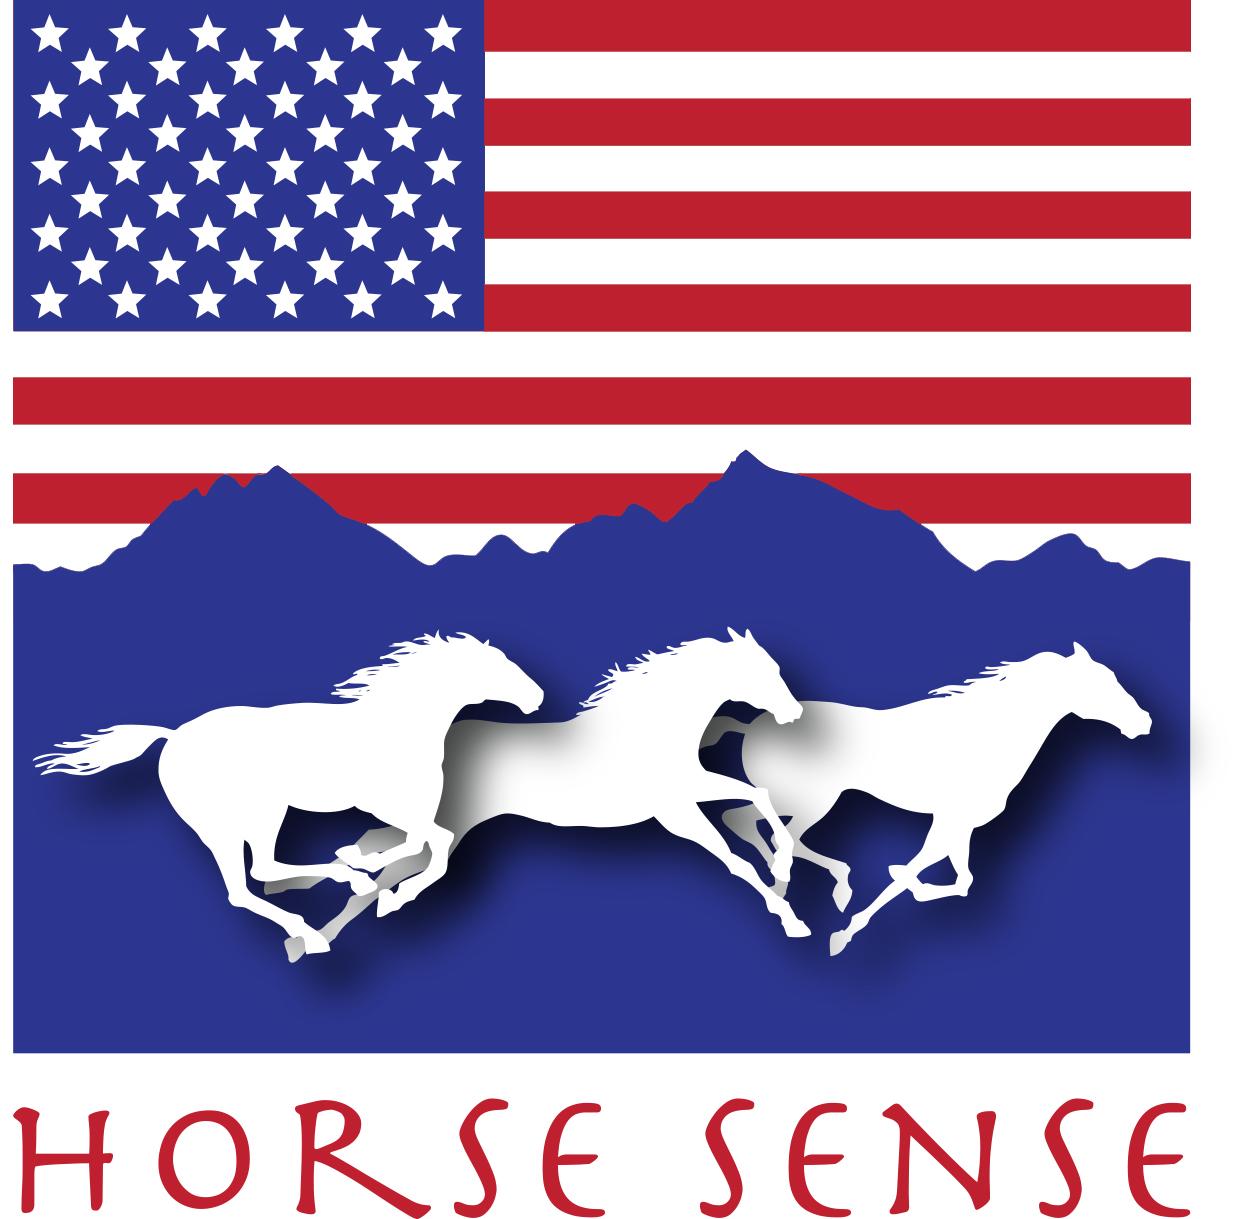 HSOTC HOHS-logo-veterans-correct.jpg